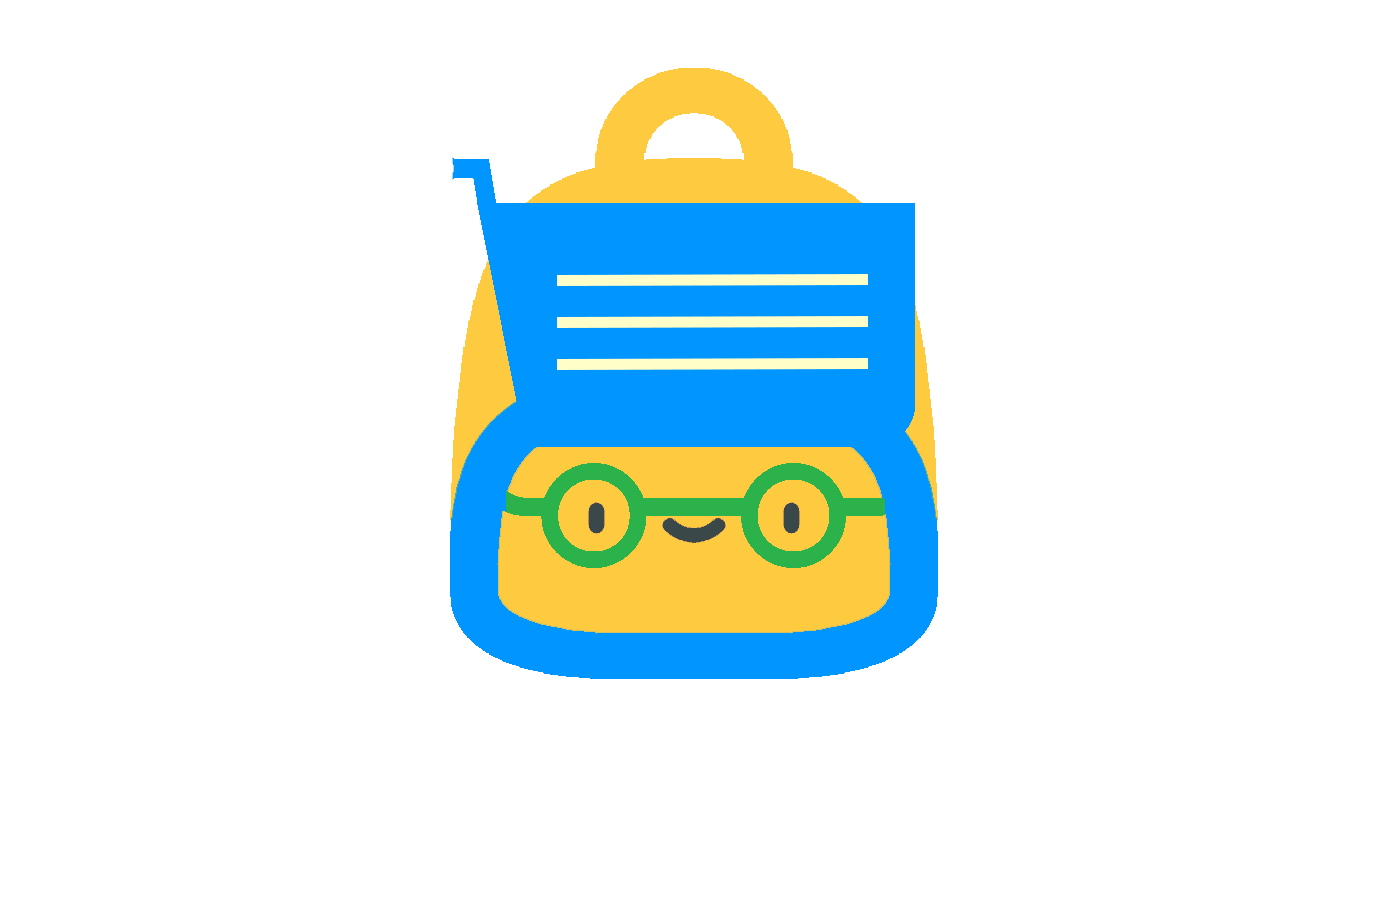 logo-rentree-scolaire-white-2